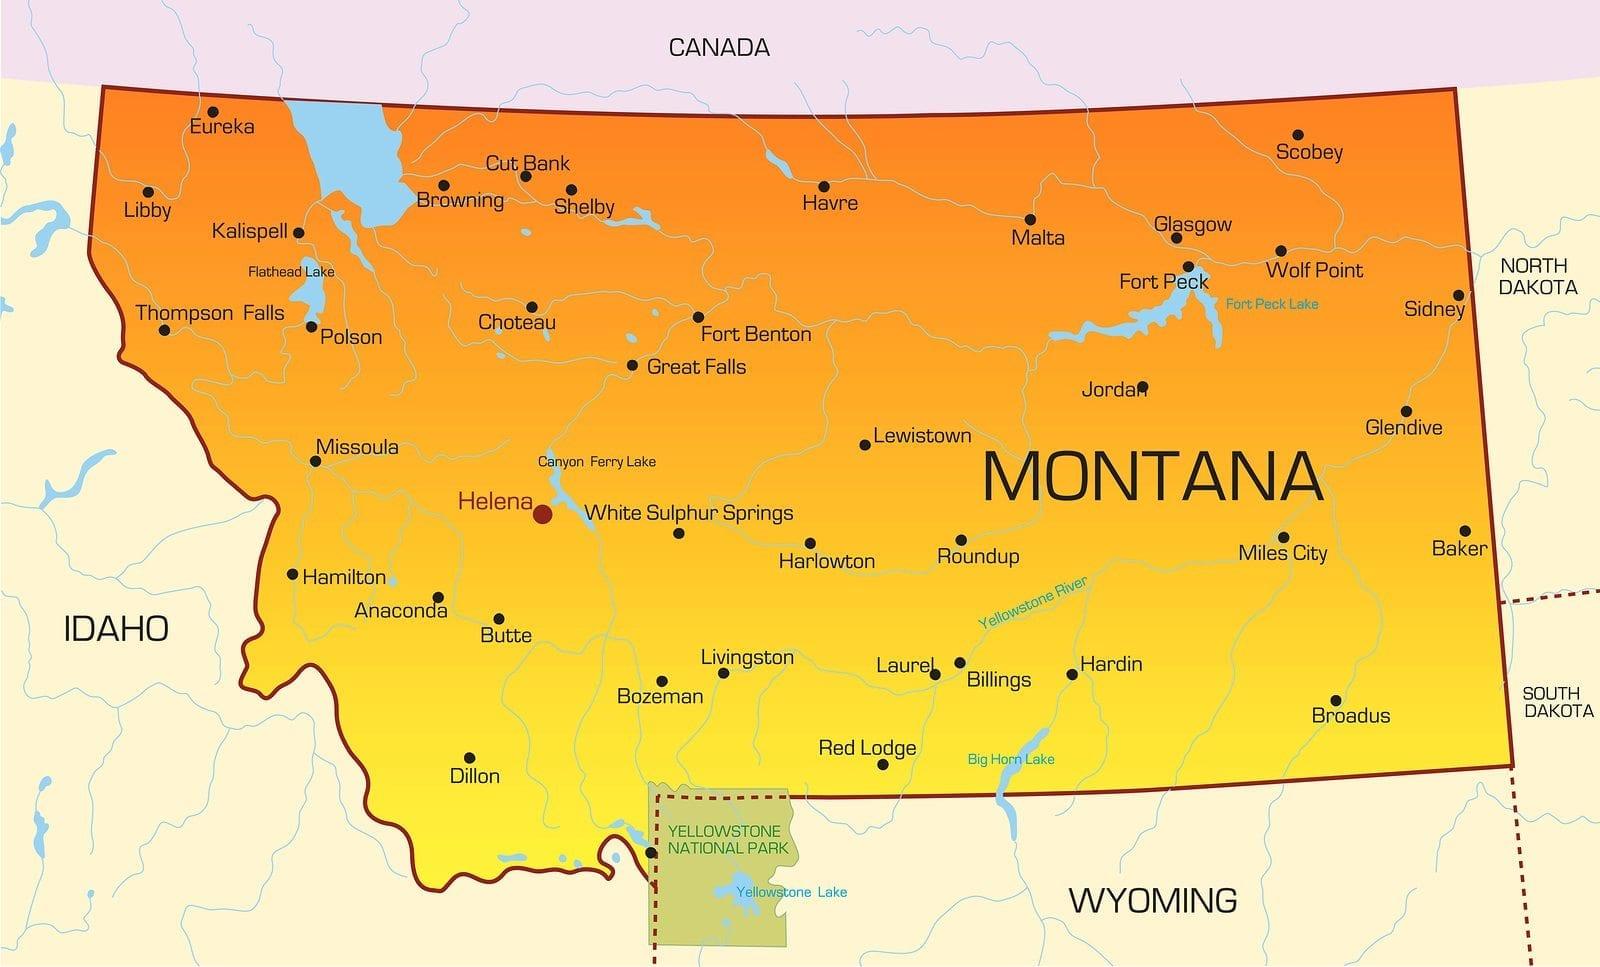 Montana Pharmacy Technician Requirements And Training Programs